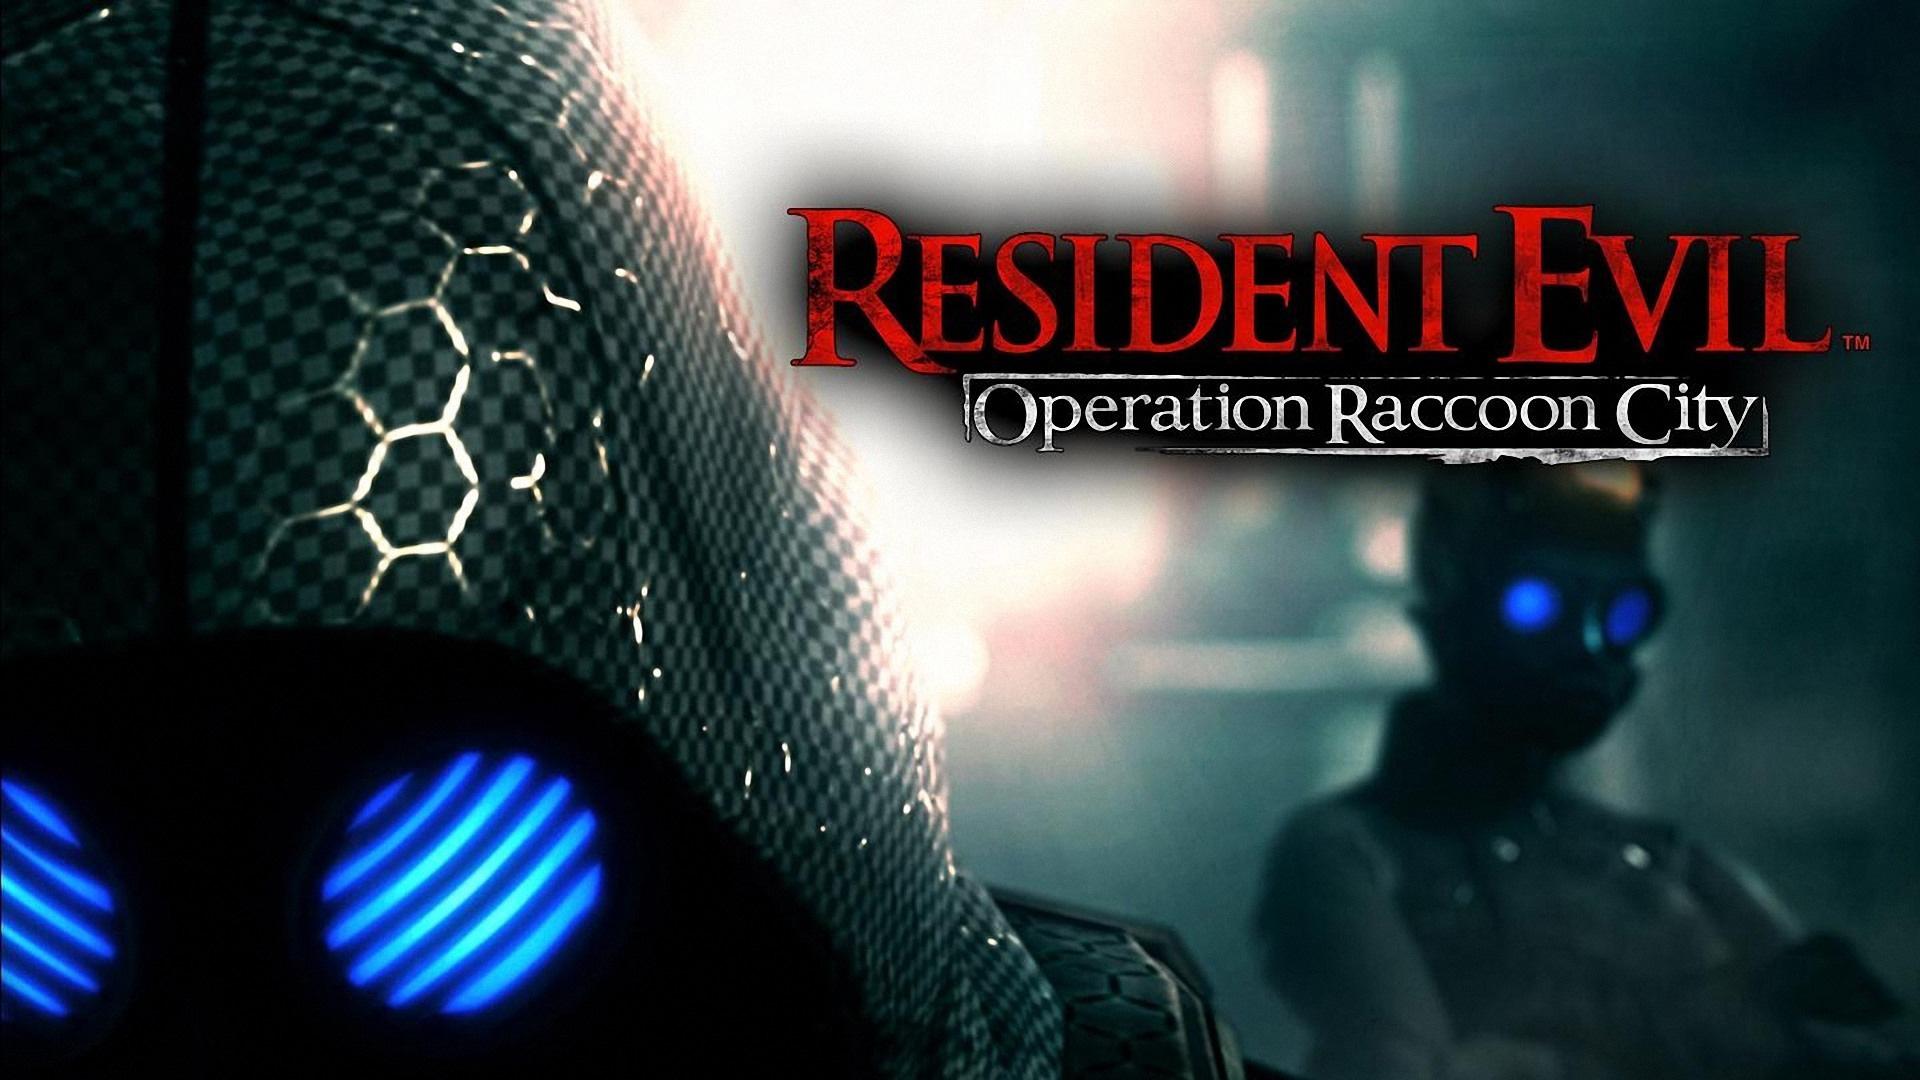 Resident-Evil-Operation-Raccoon-City-Wallpaper.jpg